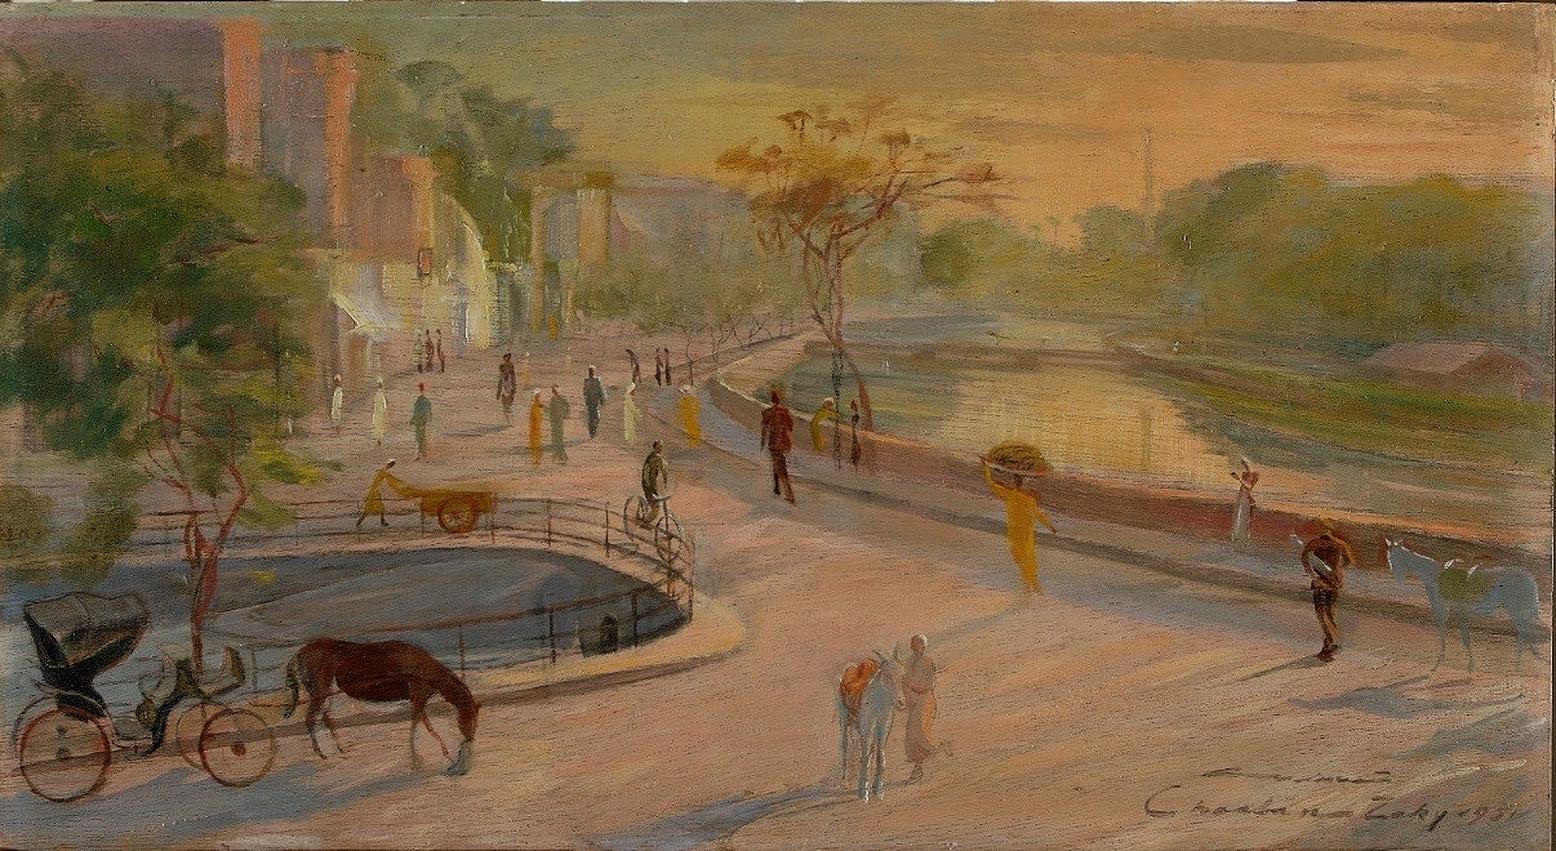 """Ain El Selin in Fayoum"" Oil Painting 14"" x 26"" inch by Shaaban Zaki"